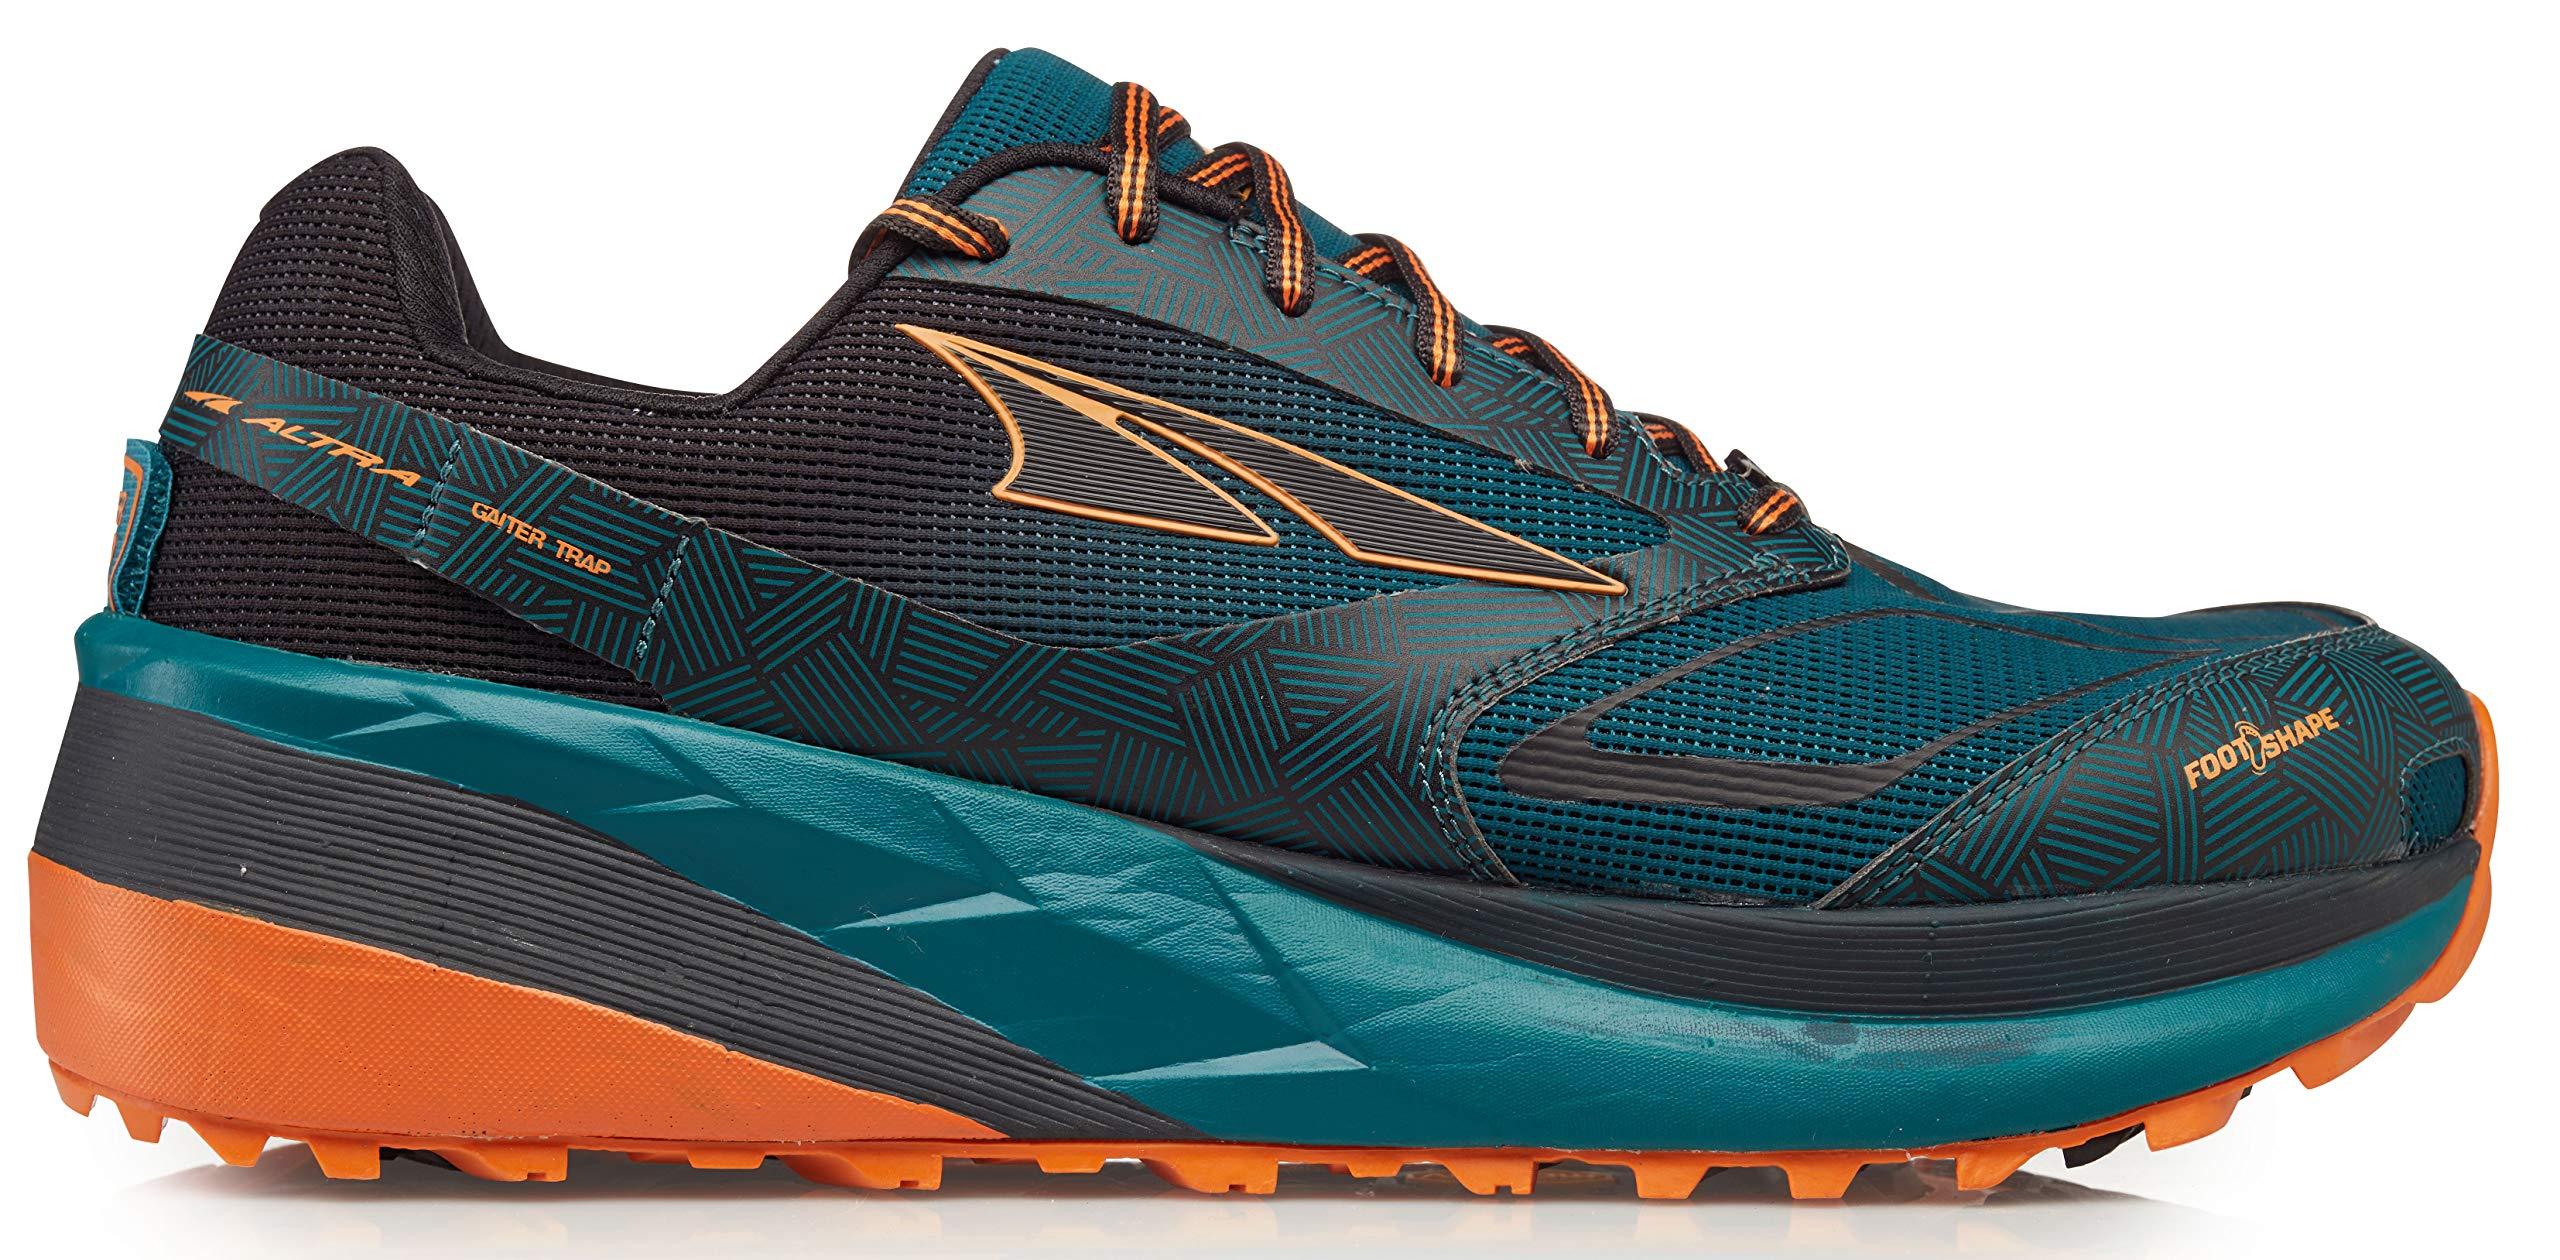 Altra Men's Olympus 3.5 Trail Running Shoe, Green/Orange - 12 M US by Altra